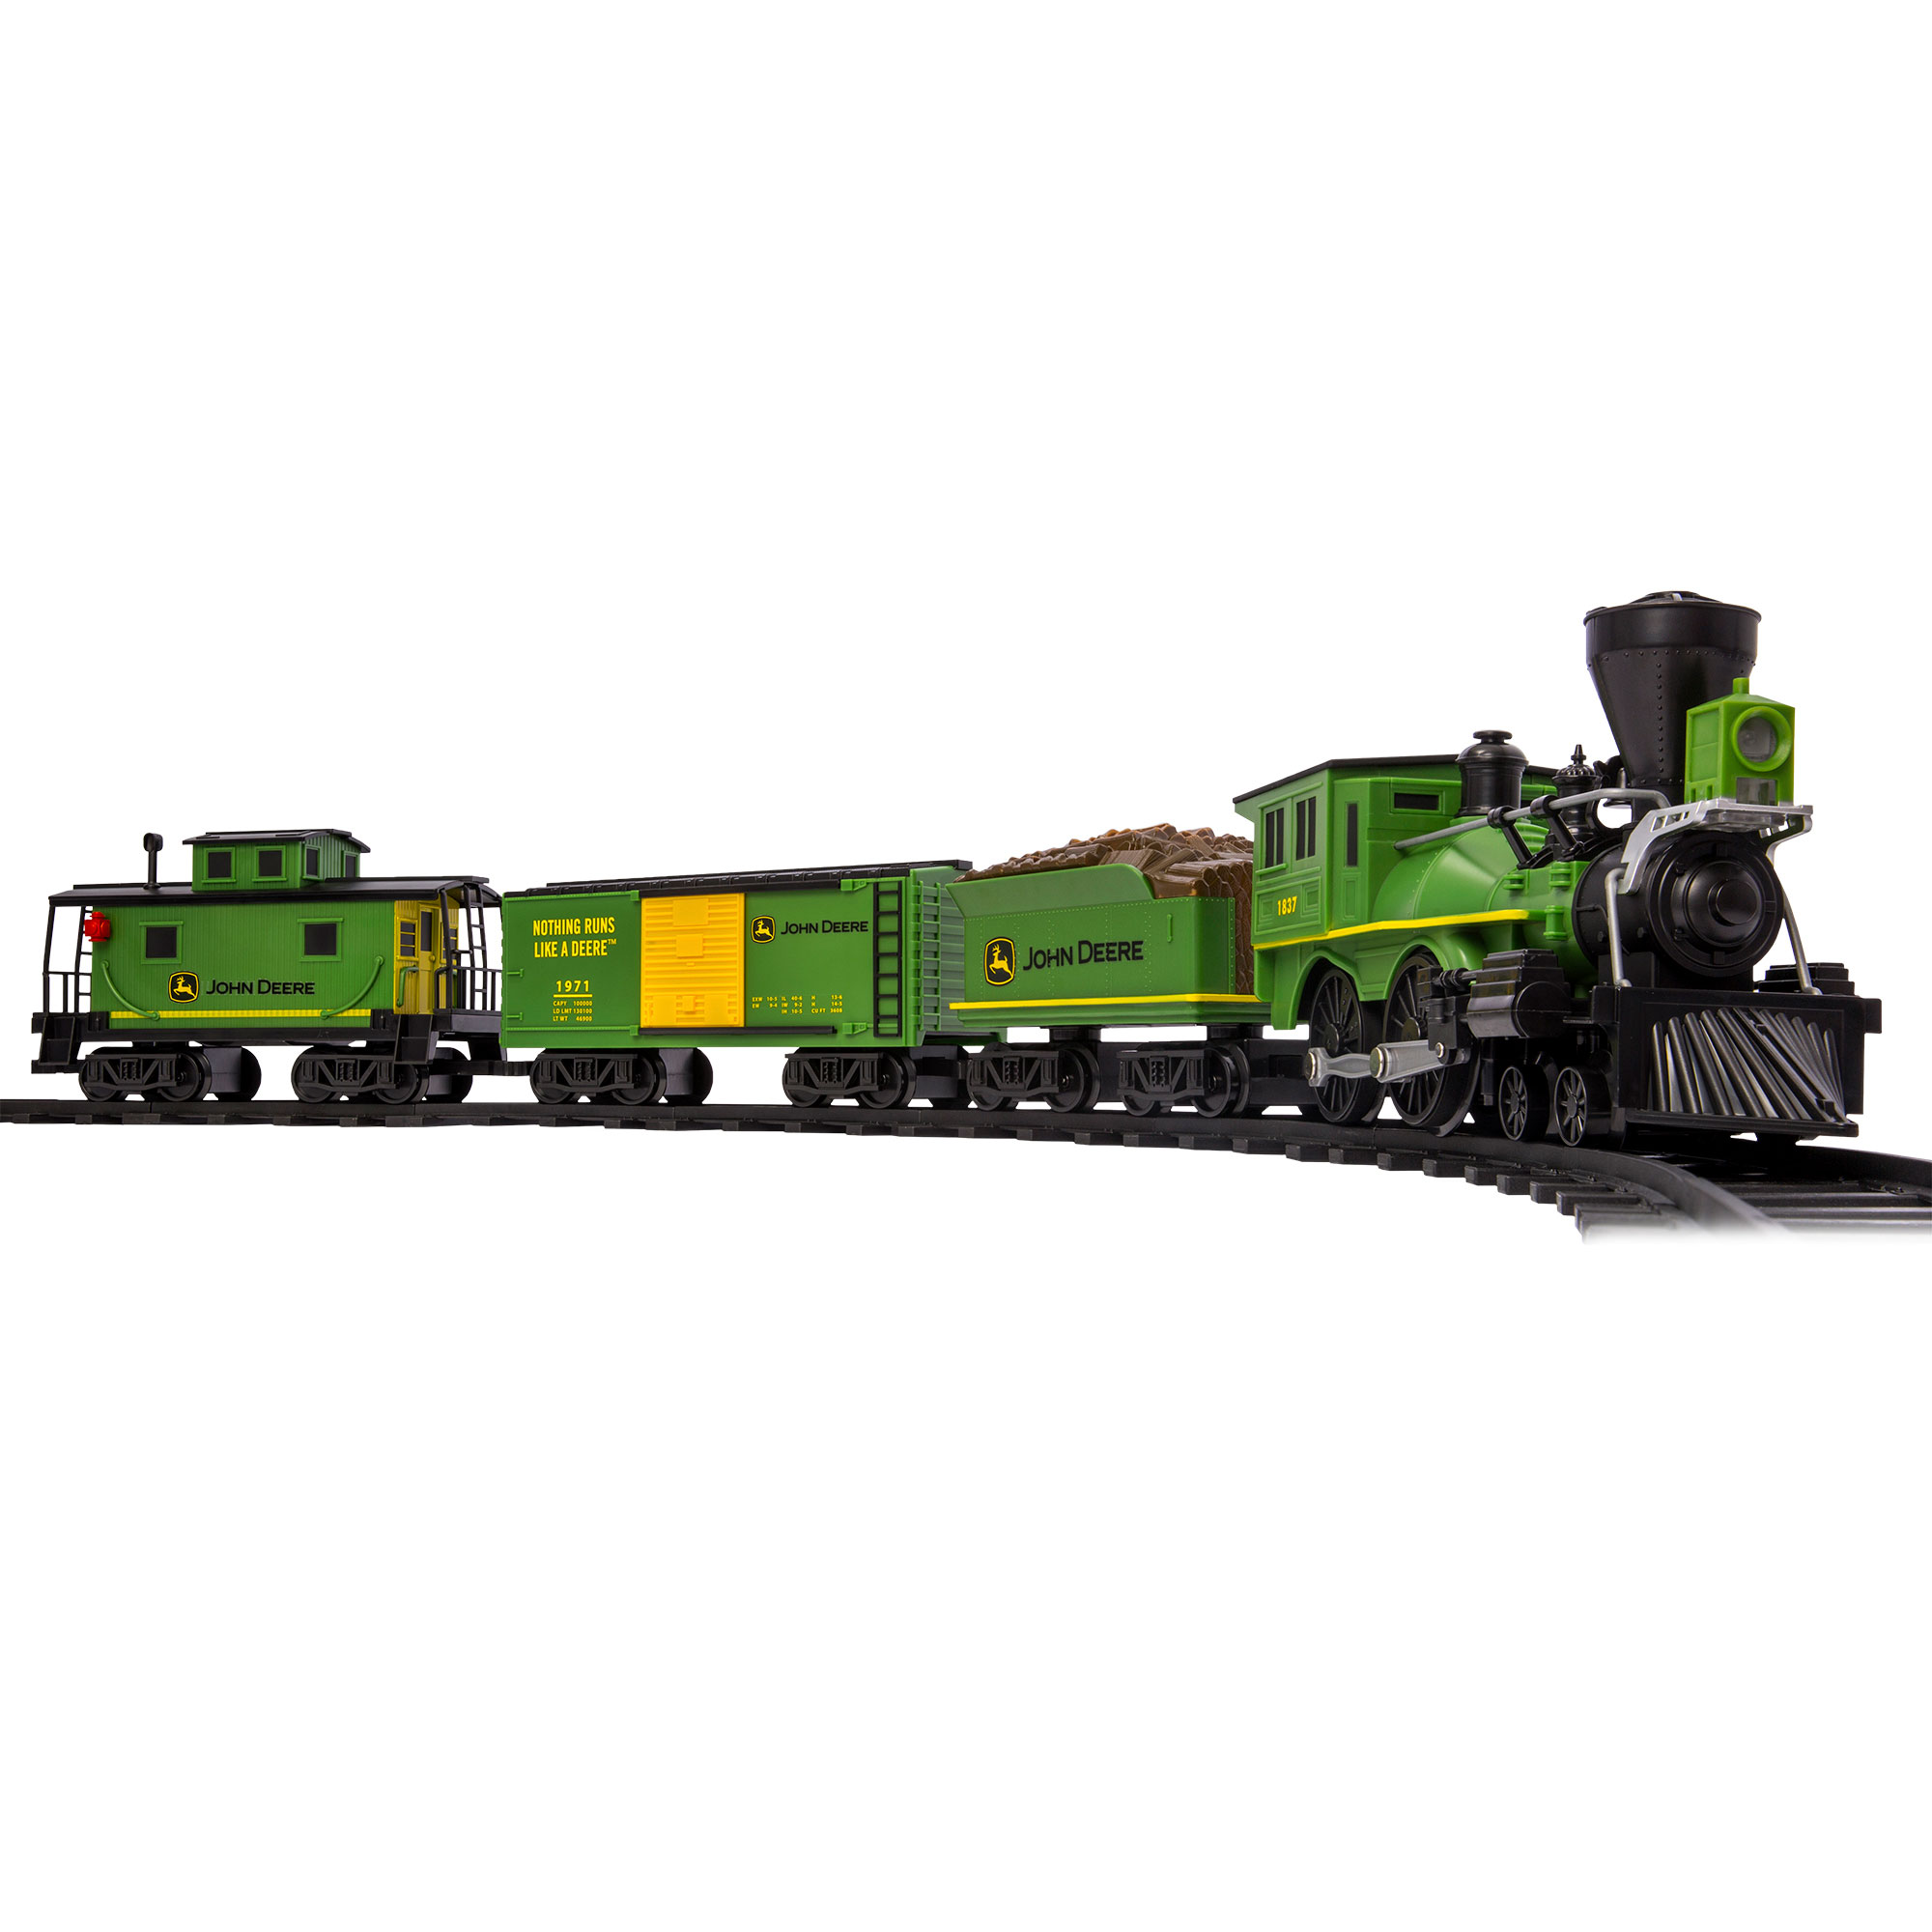 Lionel Trains John Deere Ready-to-Play Train Set